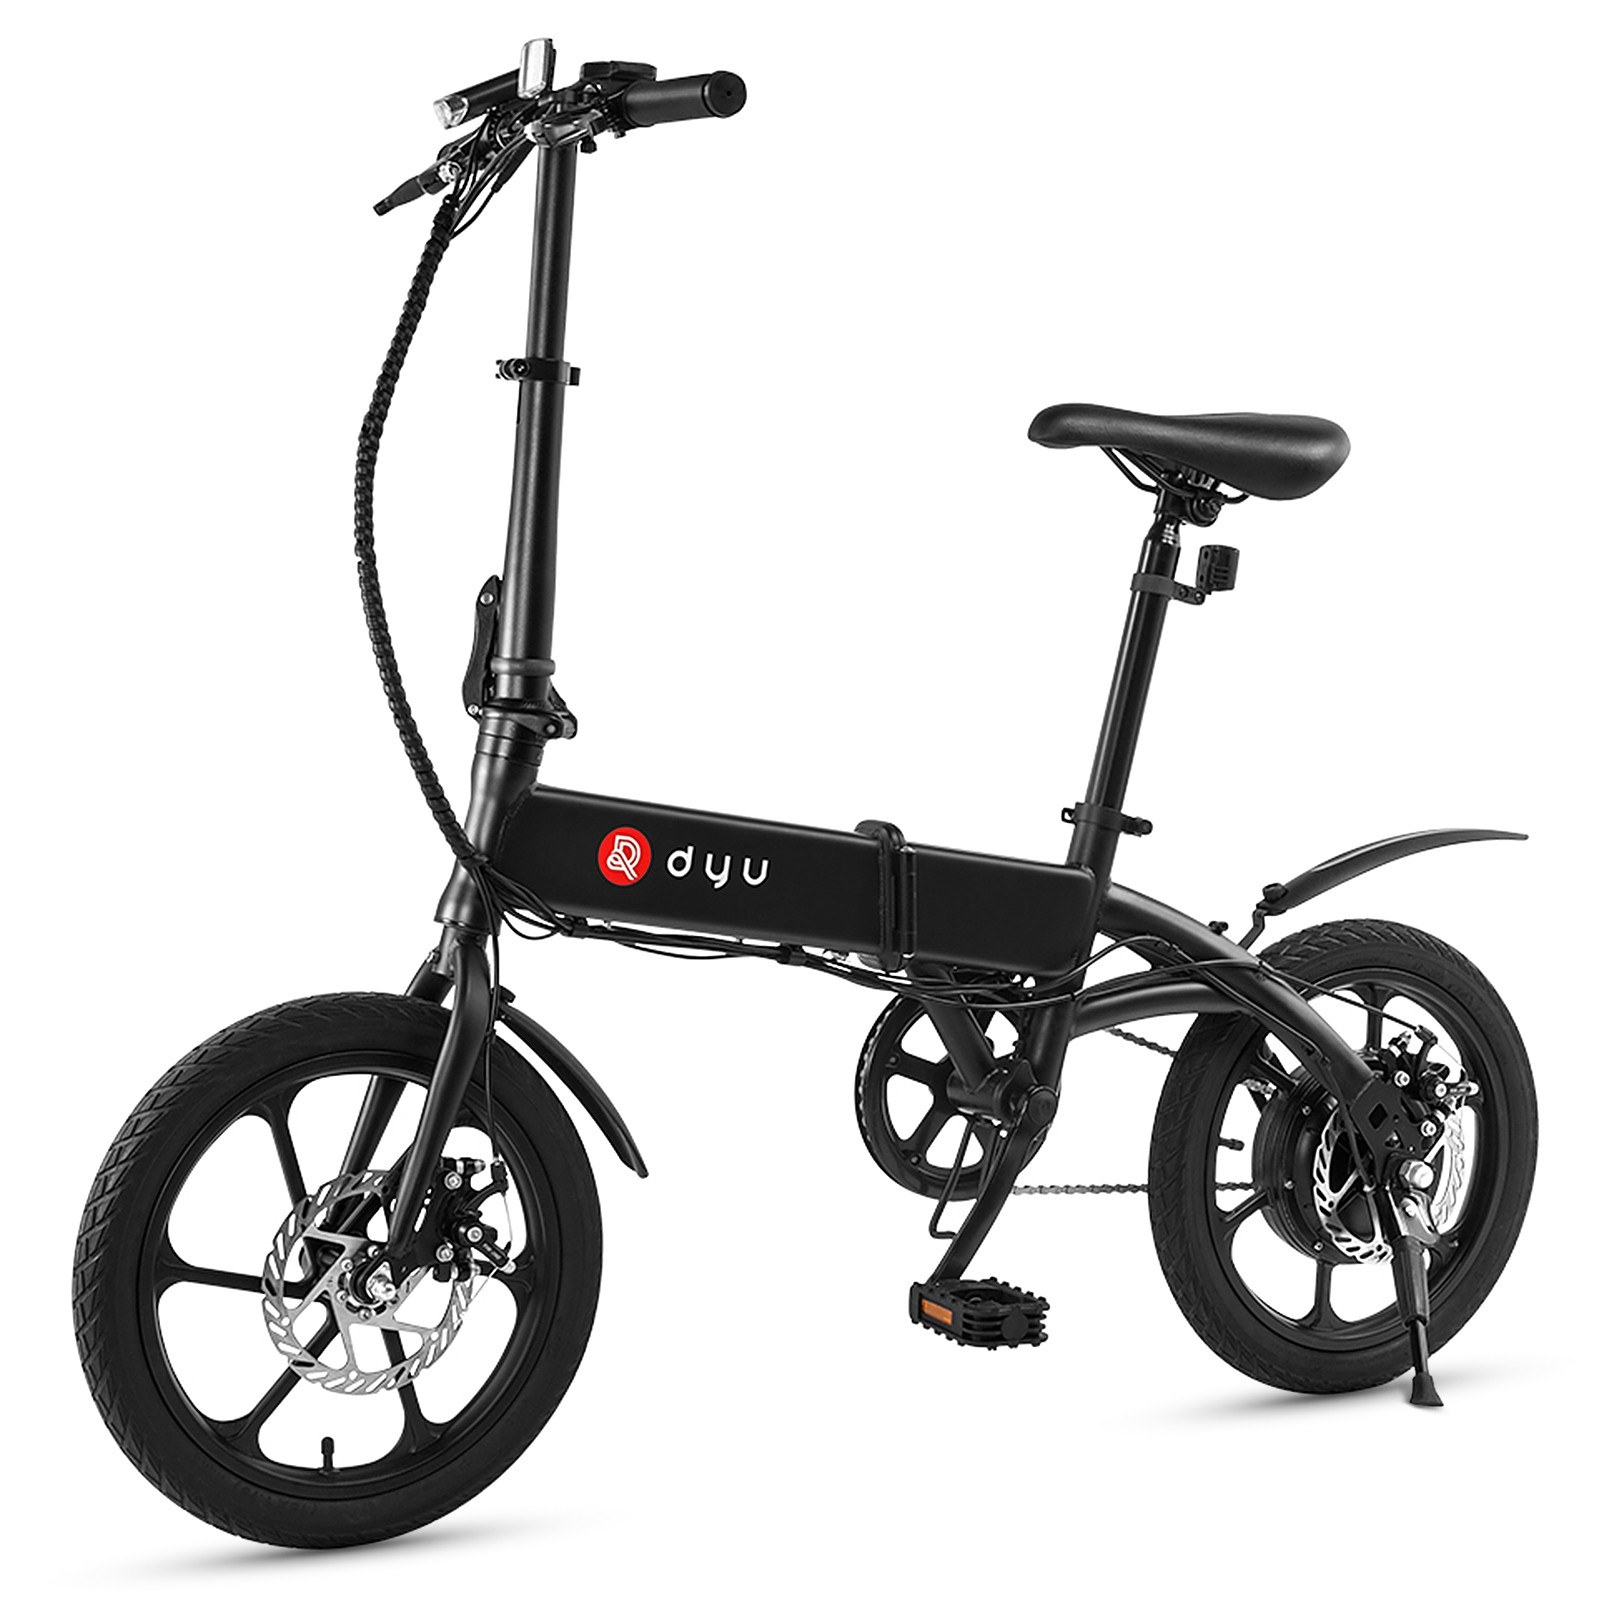 tomtop.com - [EU Warehouse] DYU A1F 16 Inch Folding Electric Bicycle, $535.70 Free Shipping (Inclusive of VAT)